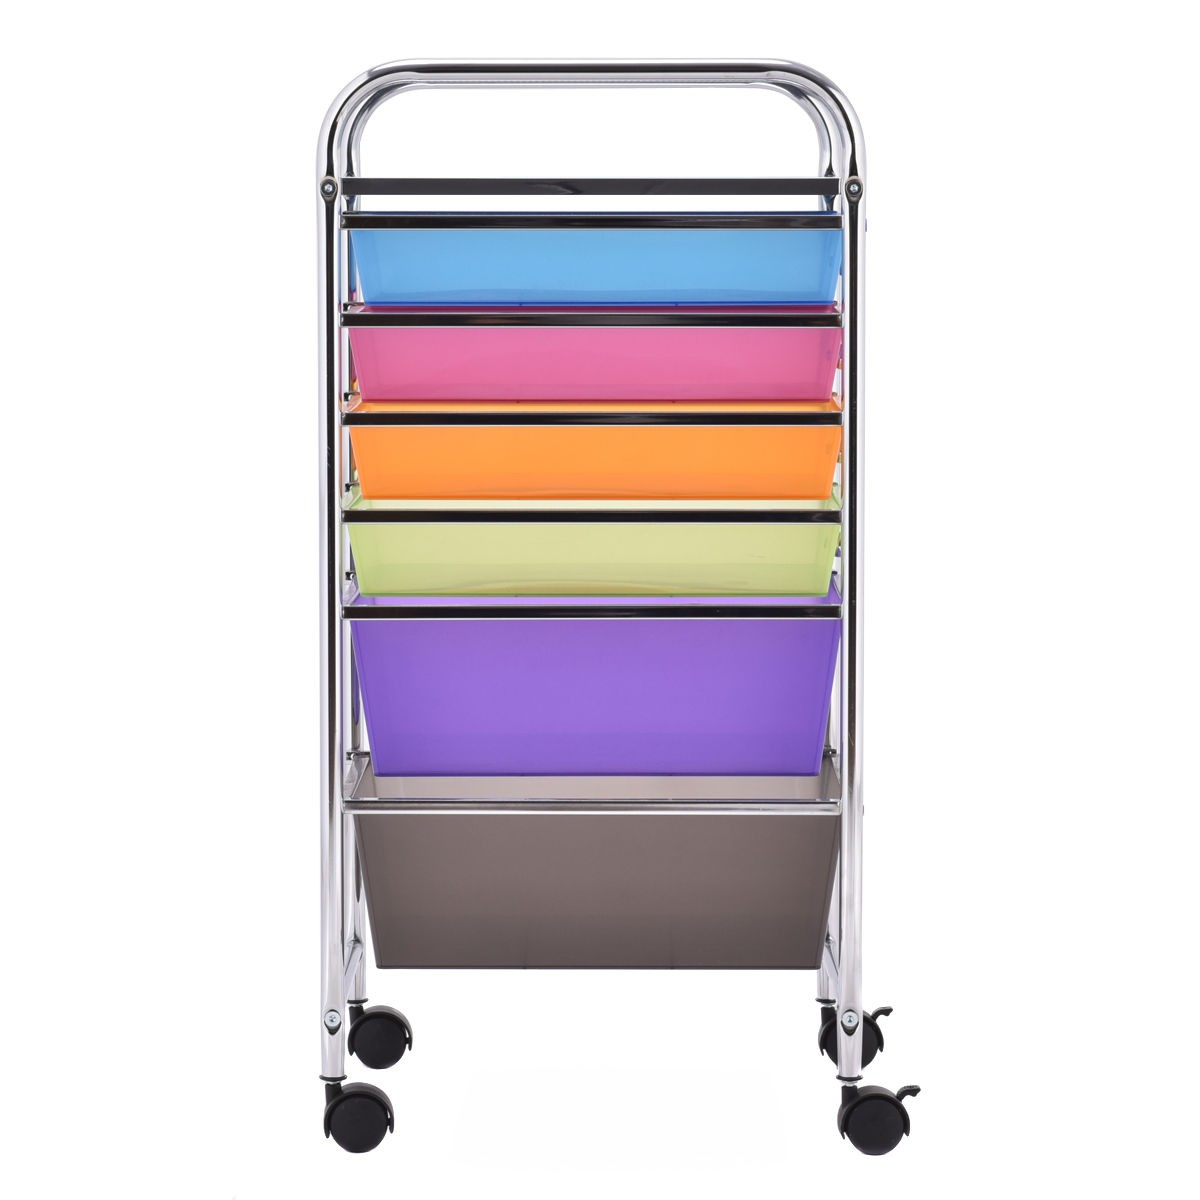 us 6 drawer rolling storage cart tools scrapbook paper